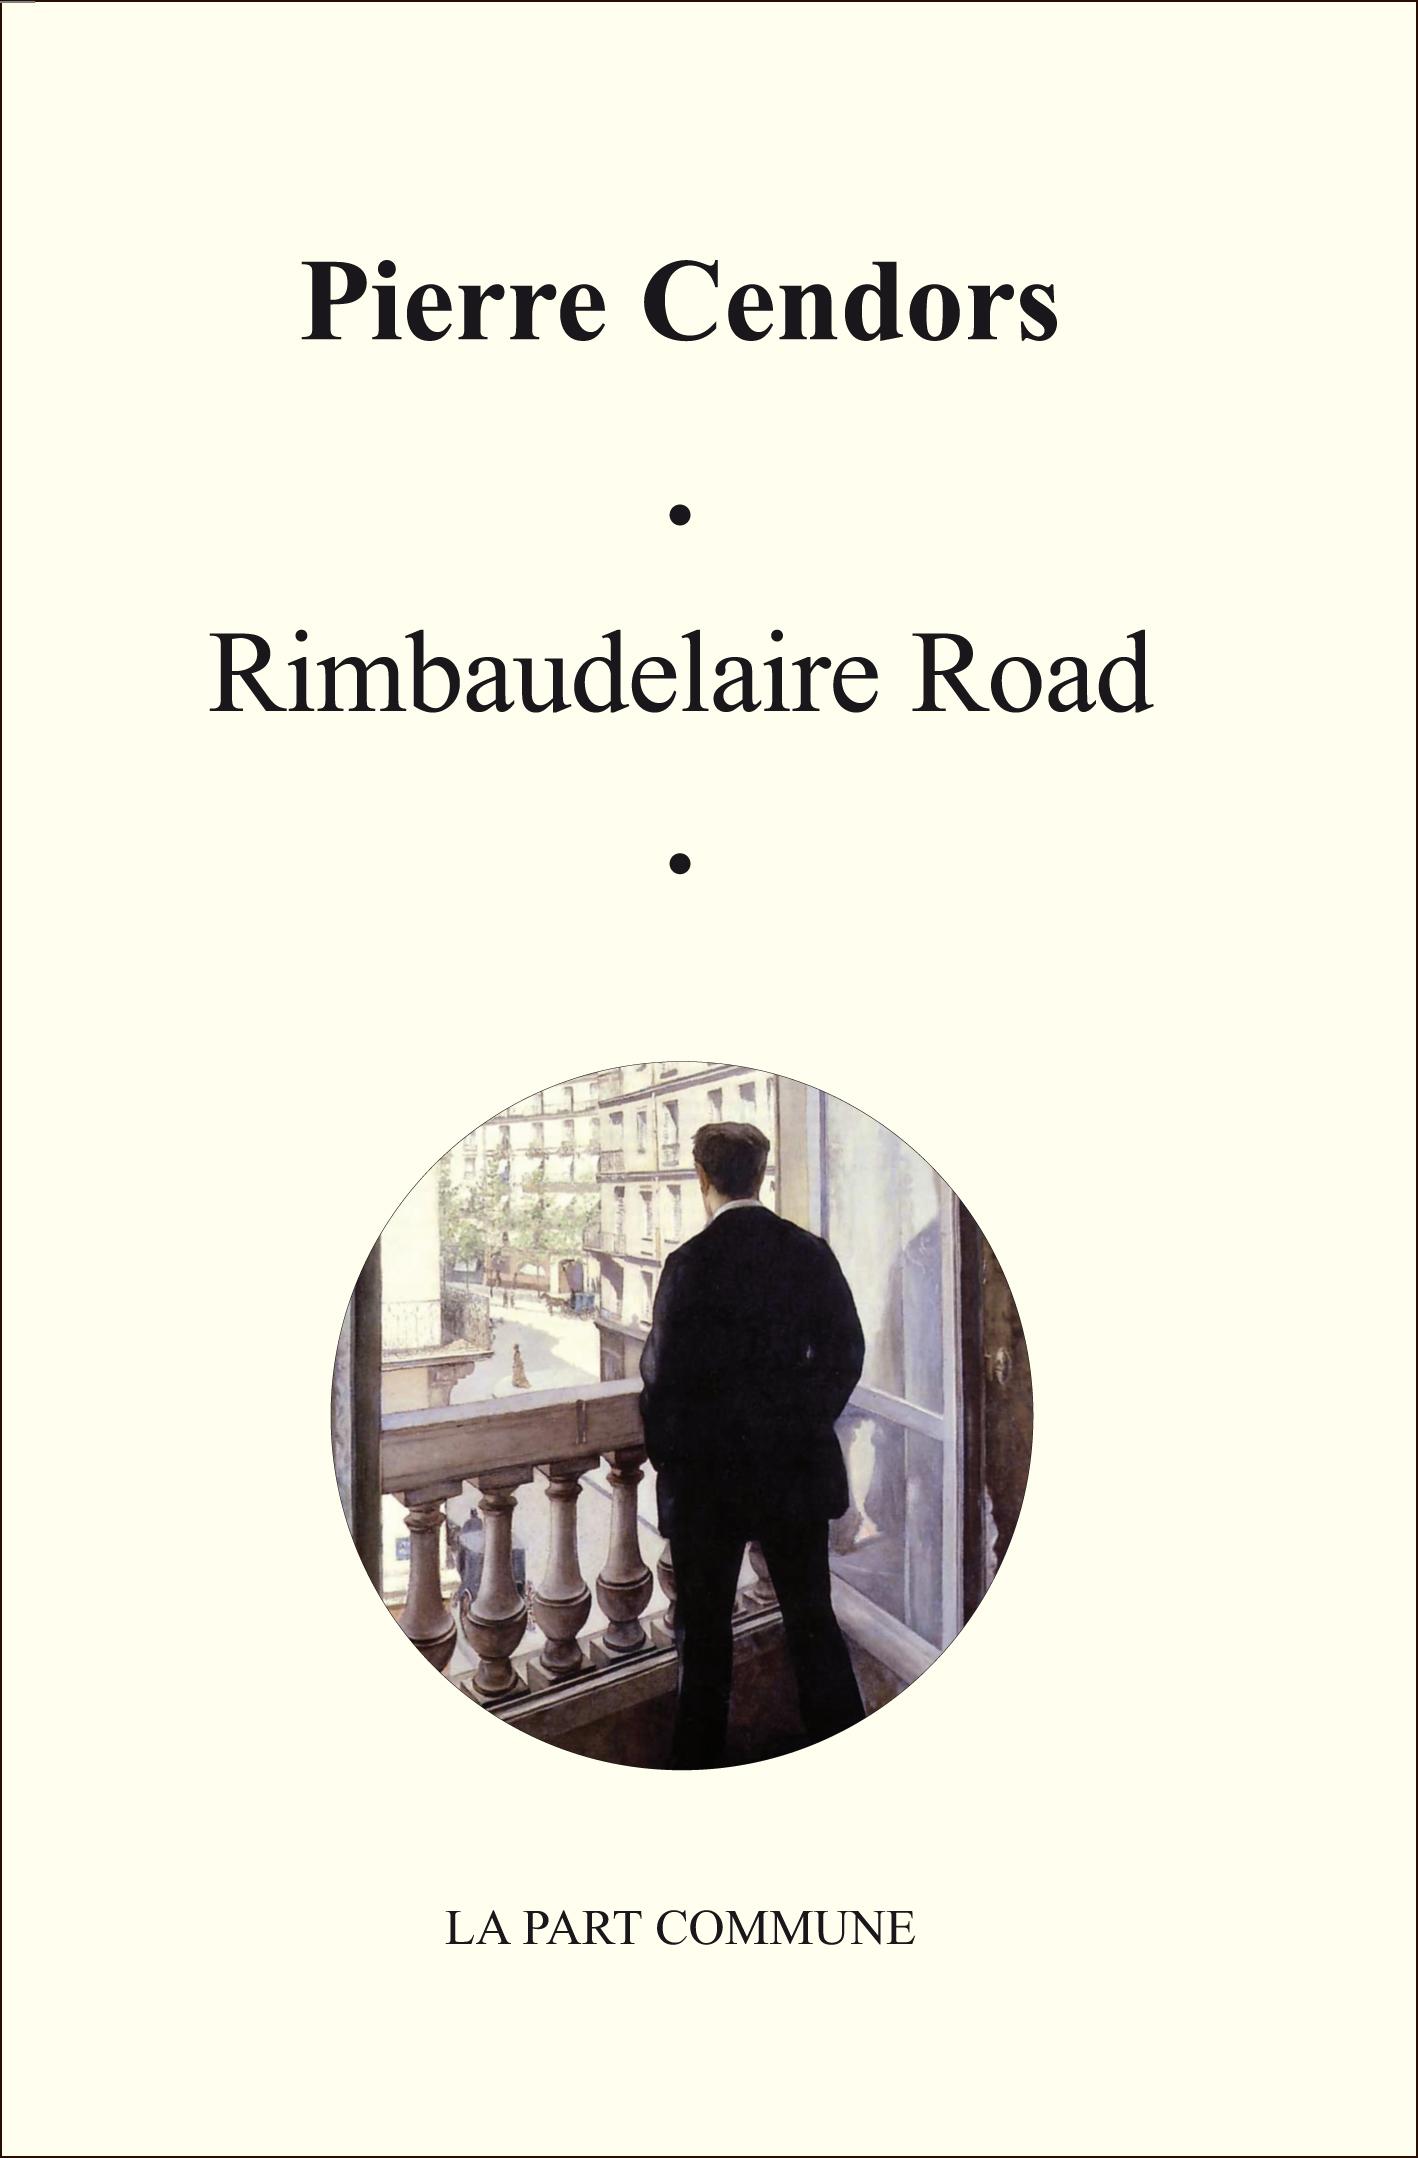 Rimbaudelaire Road